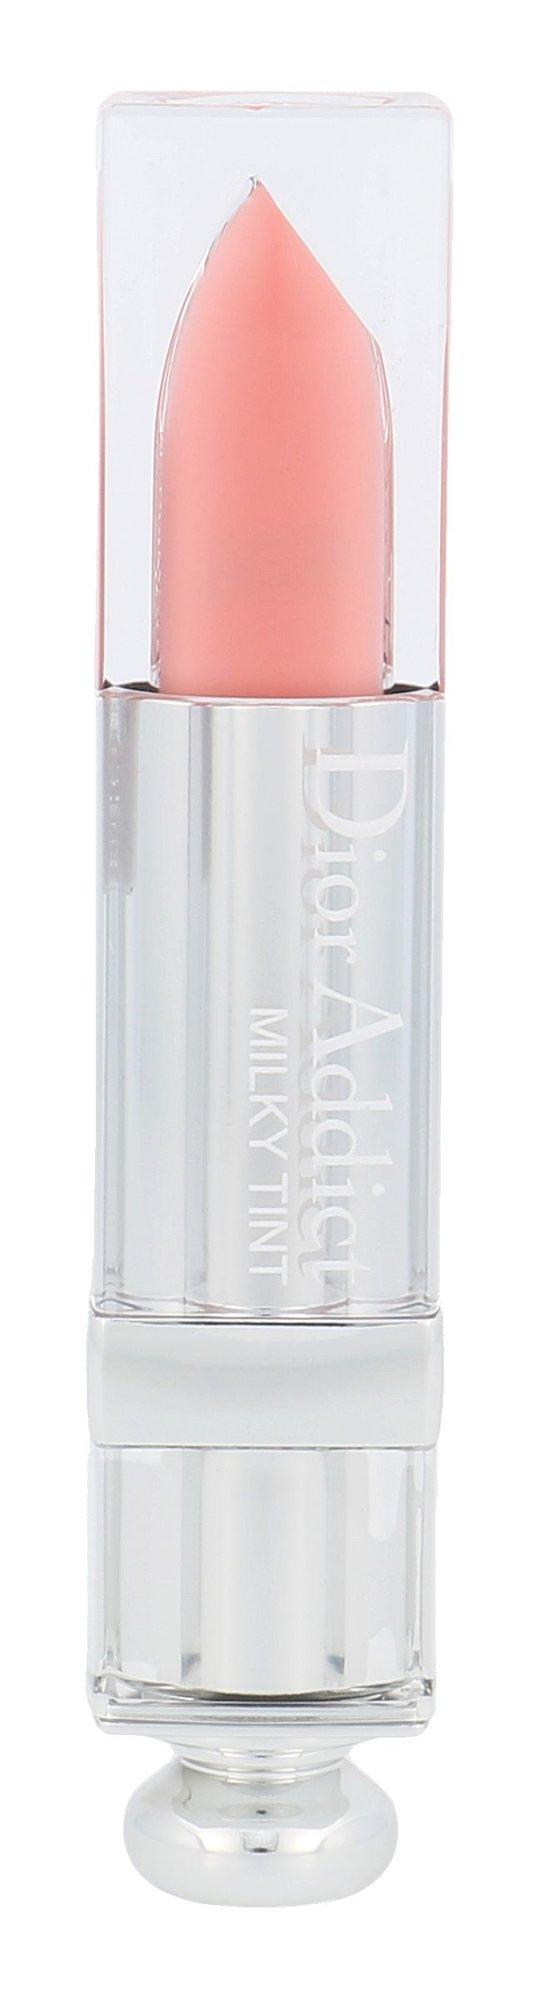 Christian Dior Addict Cosmetic 5,5ml 156 Milky Pastel Milky Tint